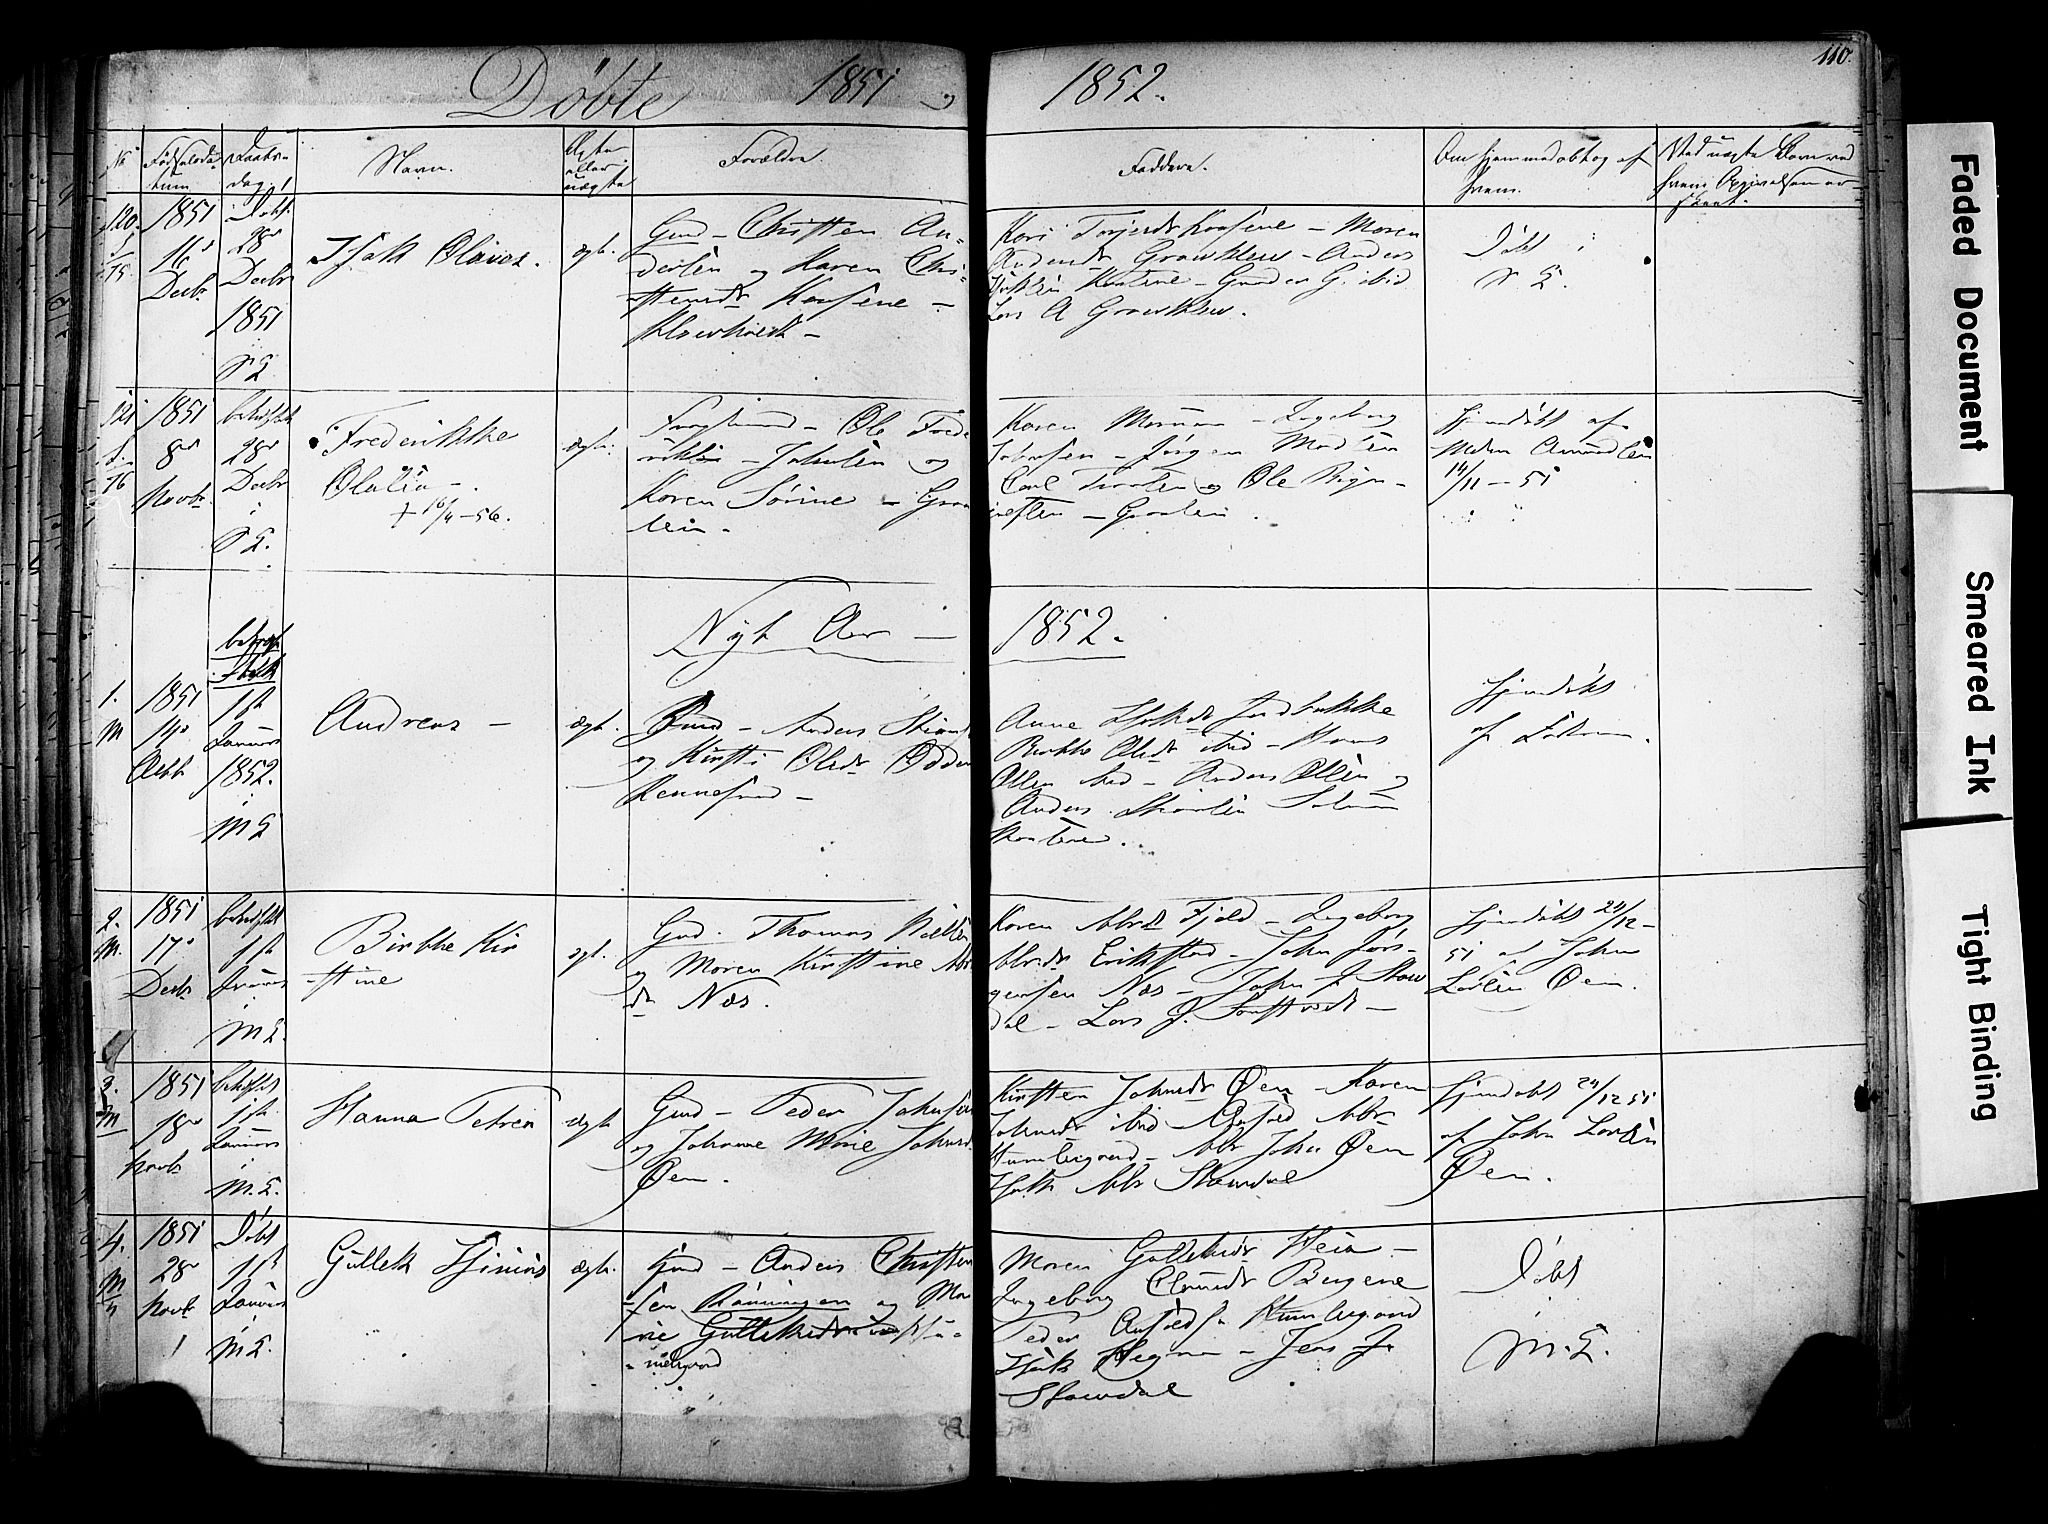 SAKO, Solum kirkebøker, F/Fa/L0006: Ministerialbok nr. I 6, 1844-1855, s. 110